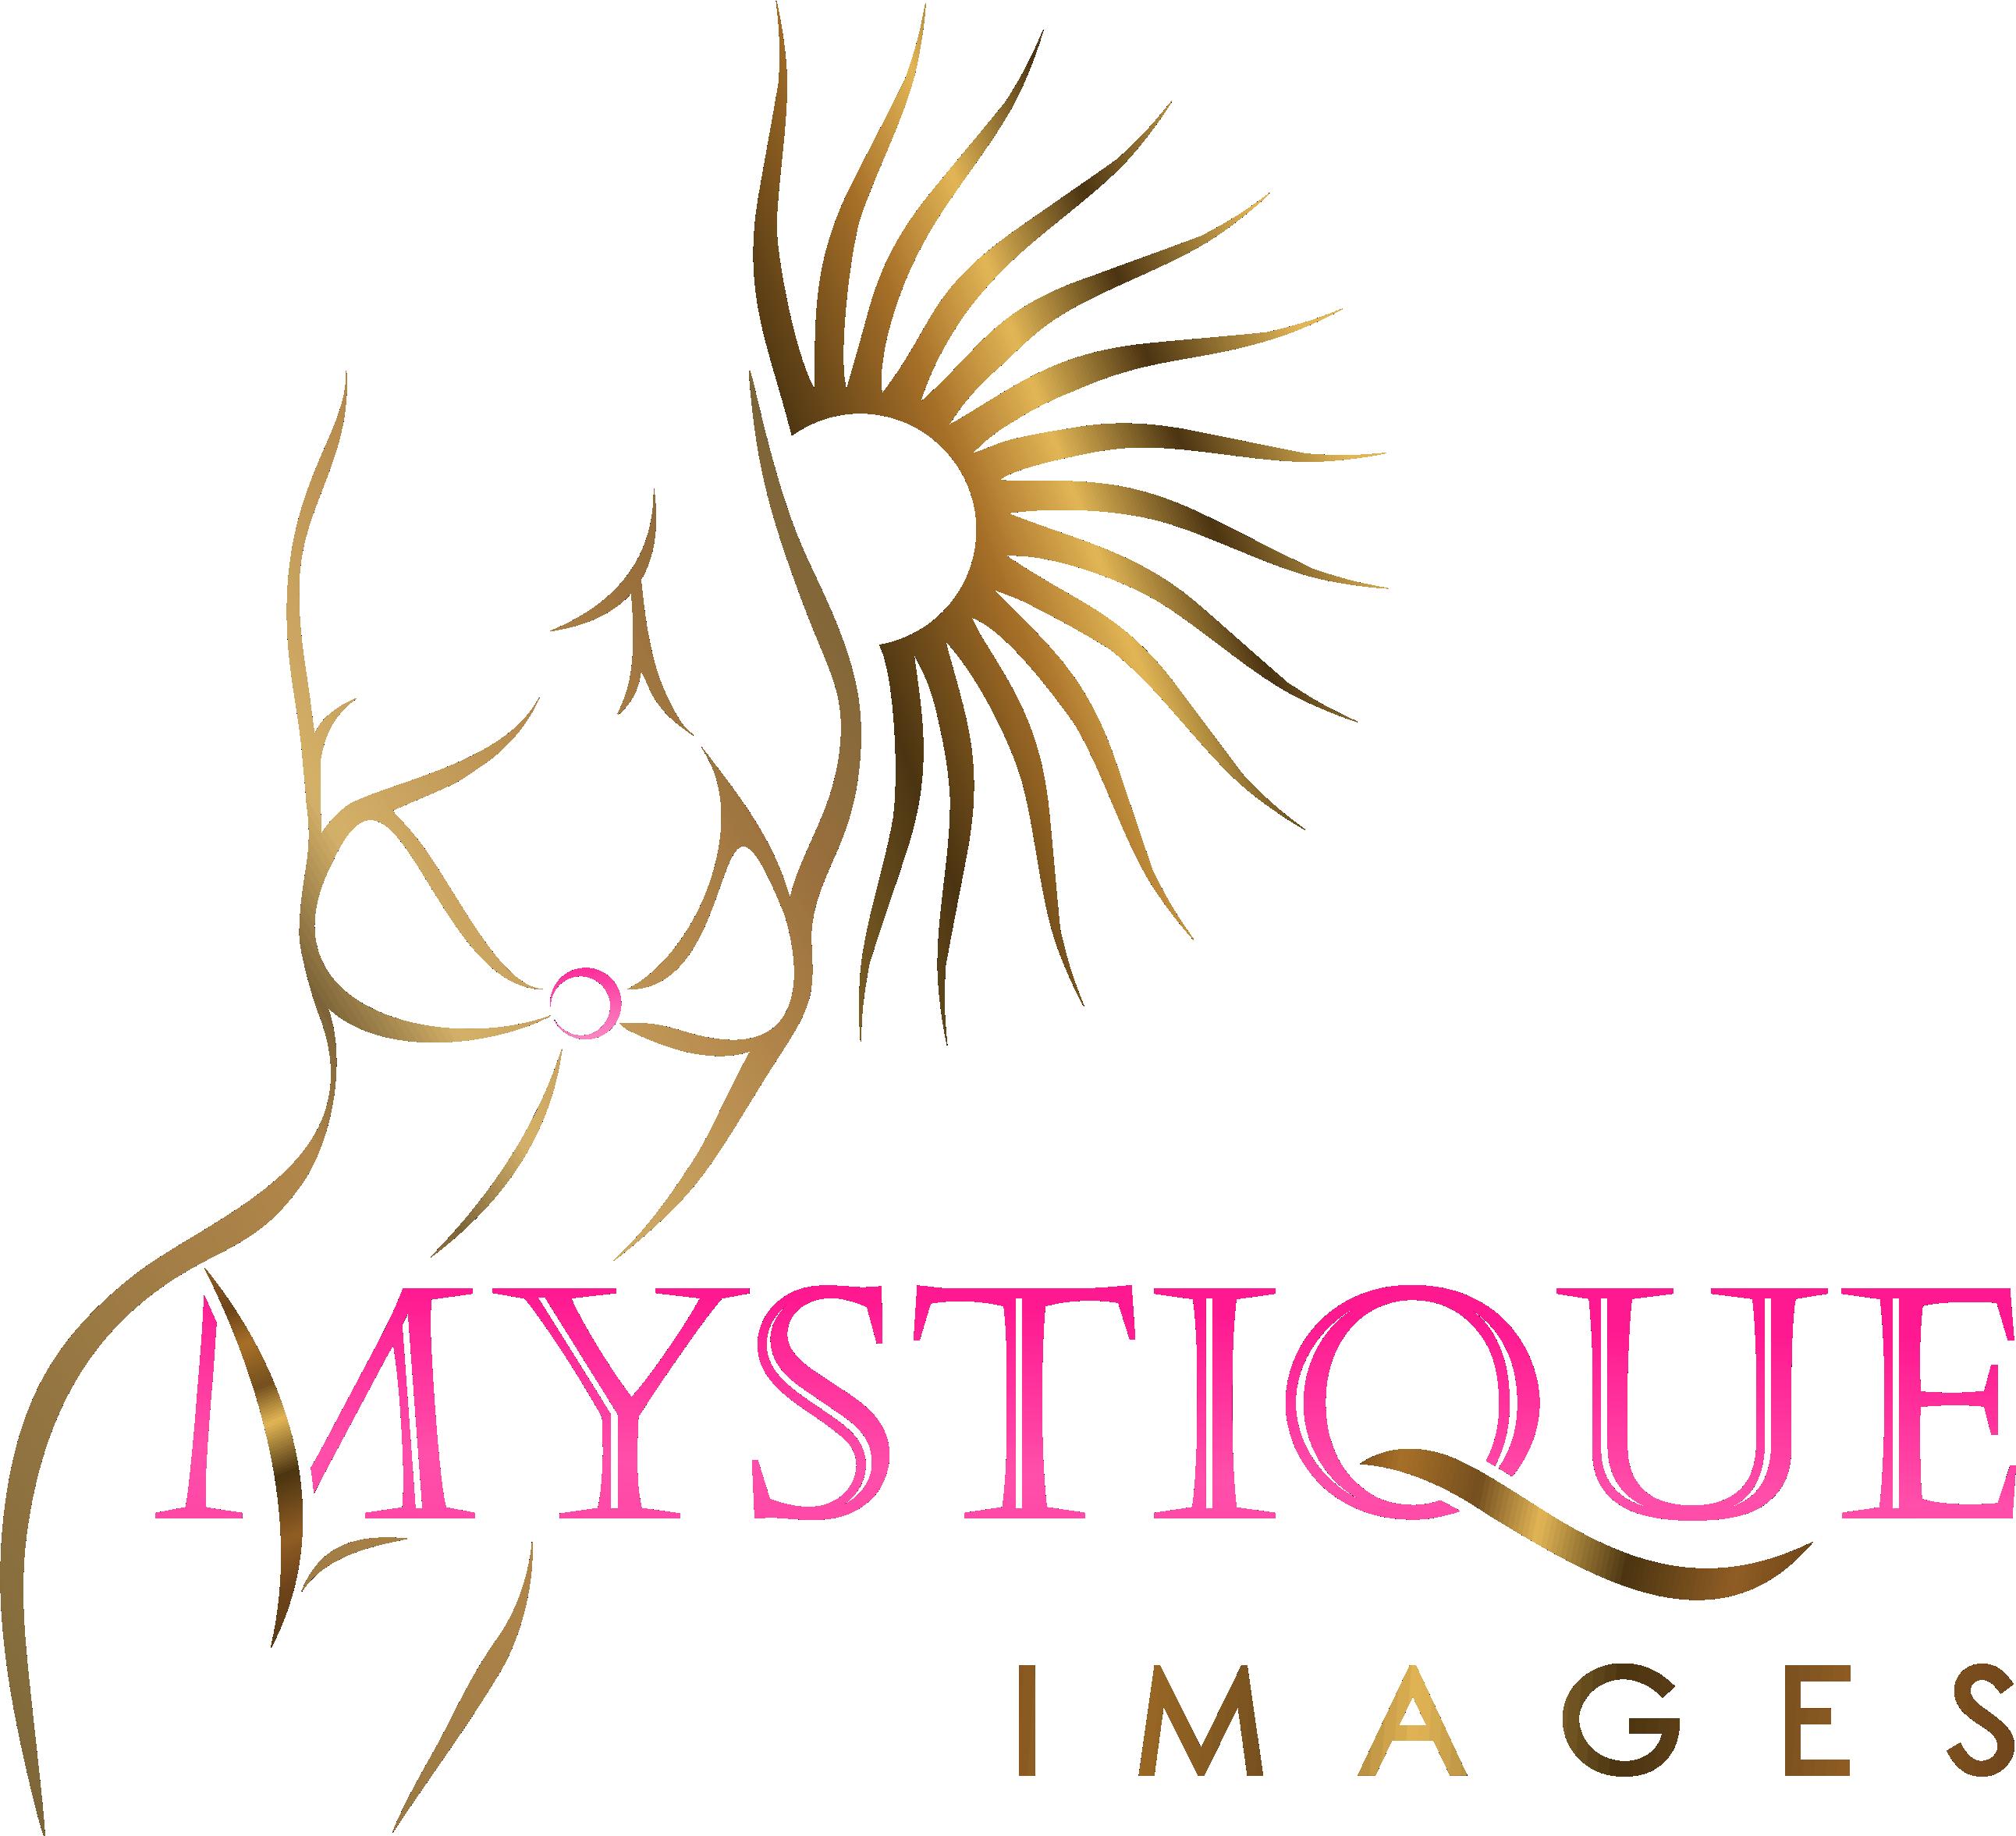 Mystique Images - Logo for tourism based swimwear modeling experiences